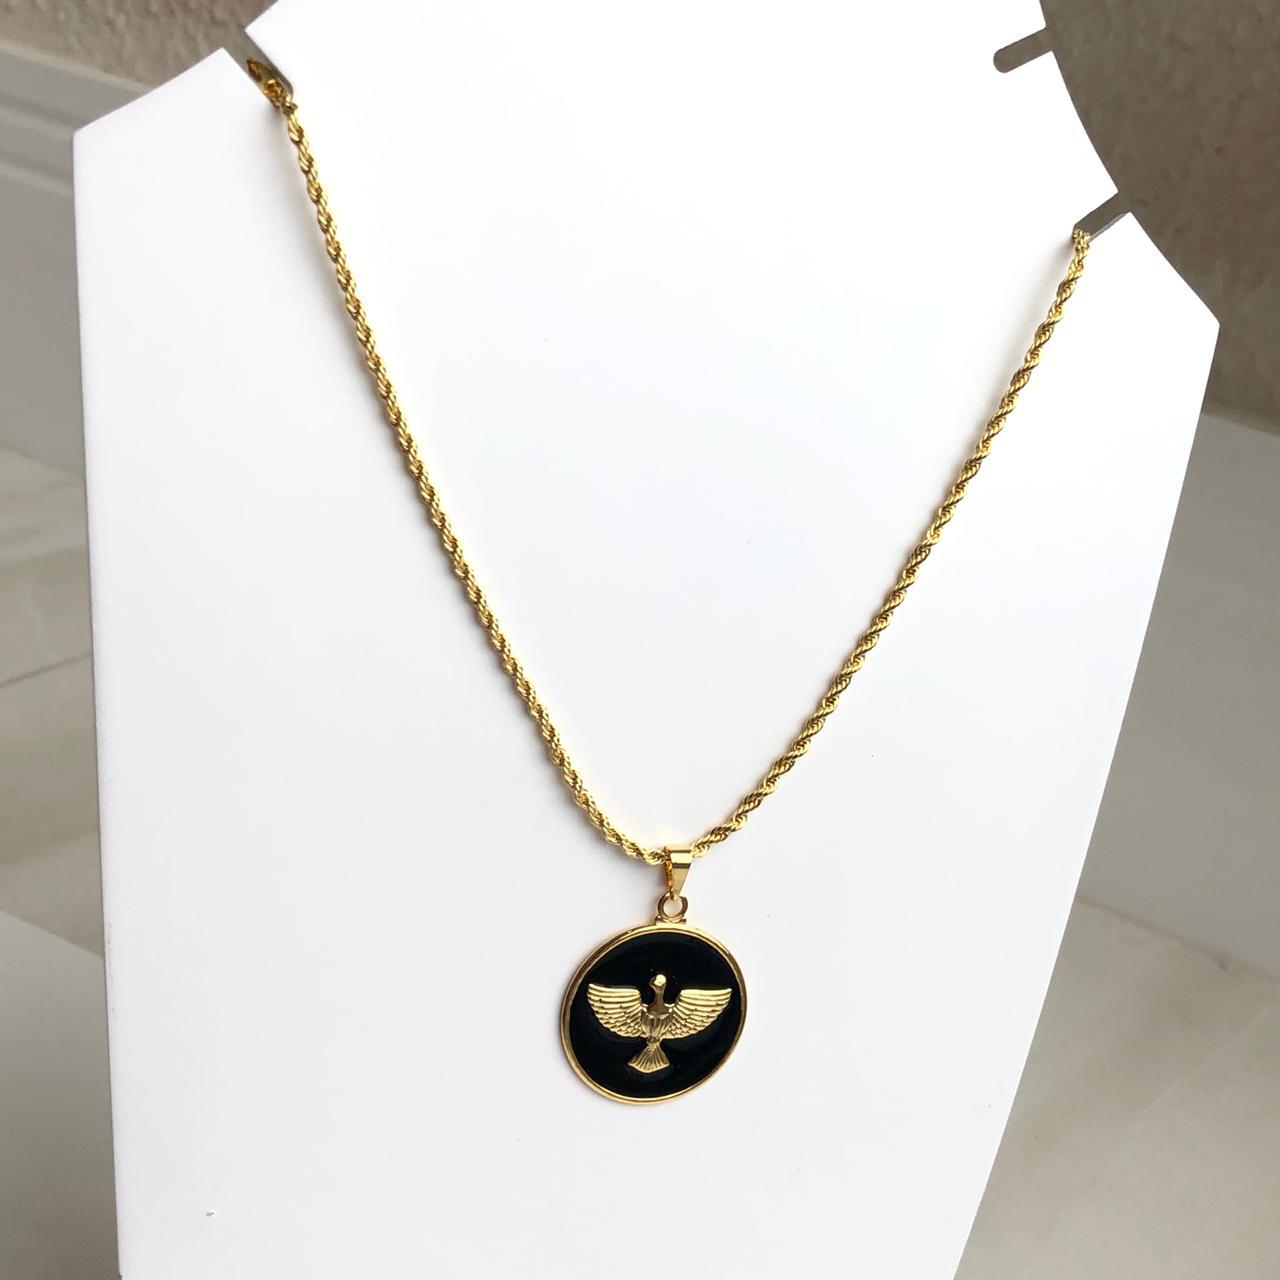 Colar folheado a ouro feminino cordão baiano Espíritoa Santo esmaltado preto liso